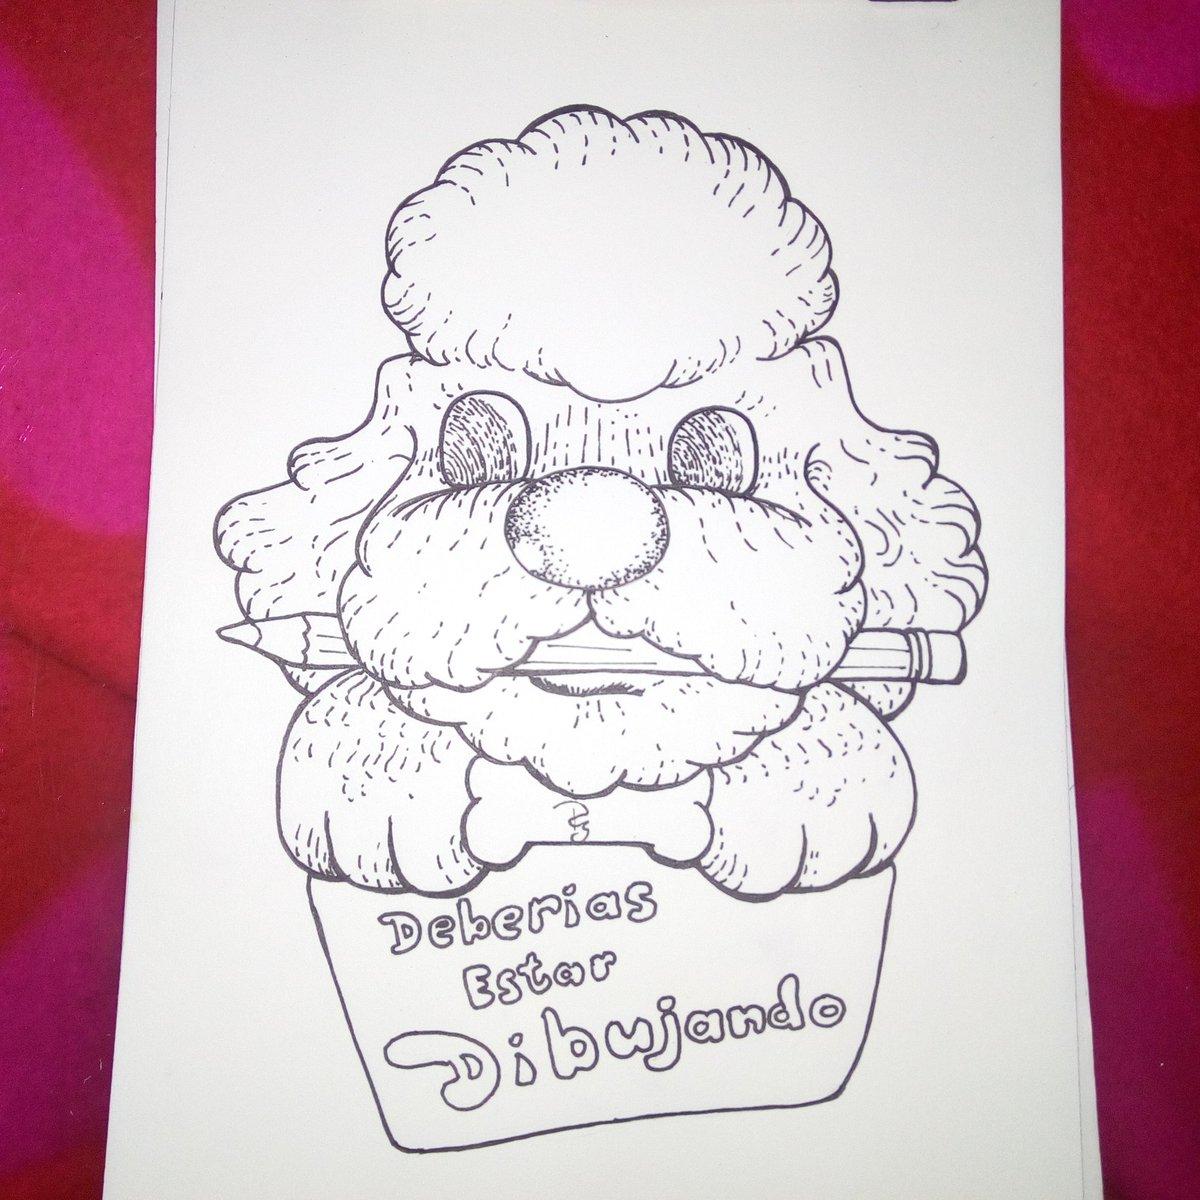 Un recordatorio necesario Dibujo diario 186 #dibujodeldía #copicmarkers #kawaiiartpic.twitter.com/7rDkWtq78X